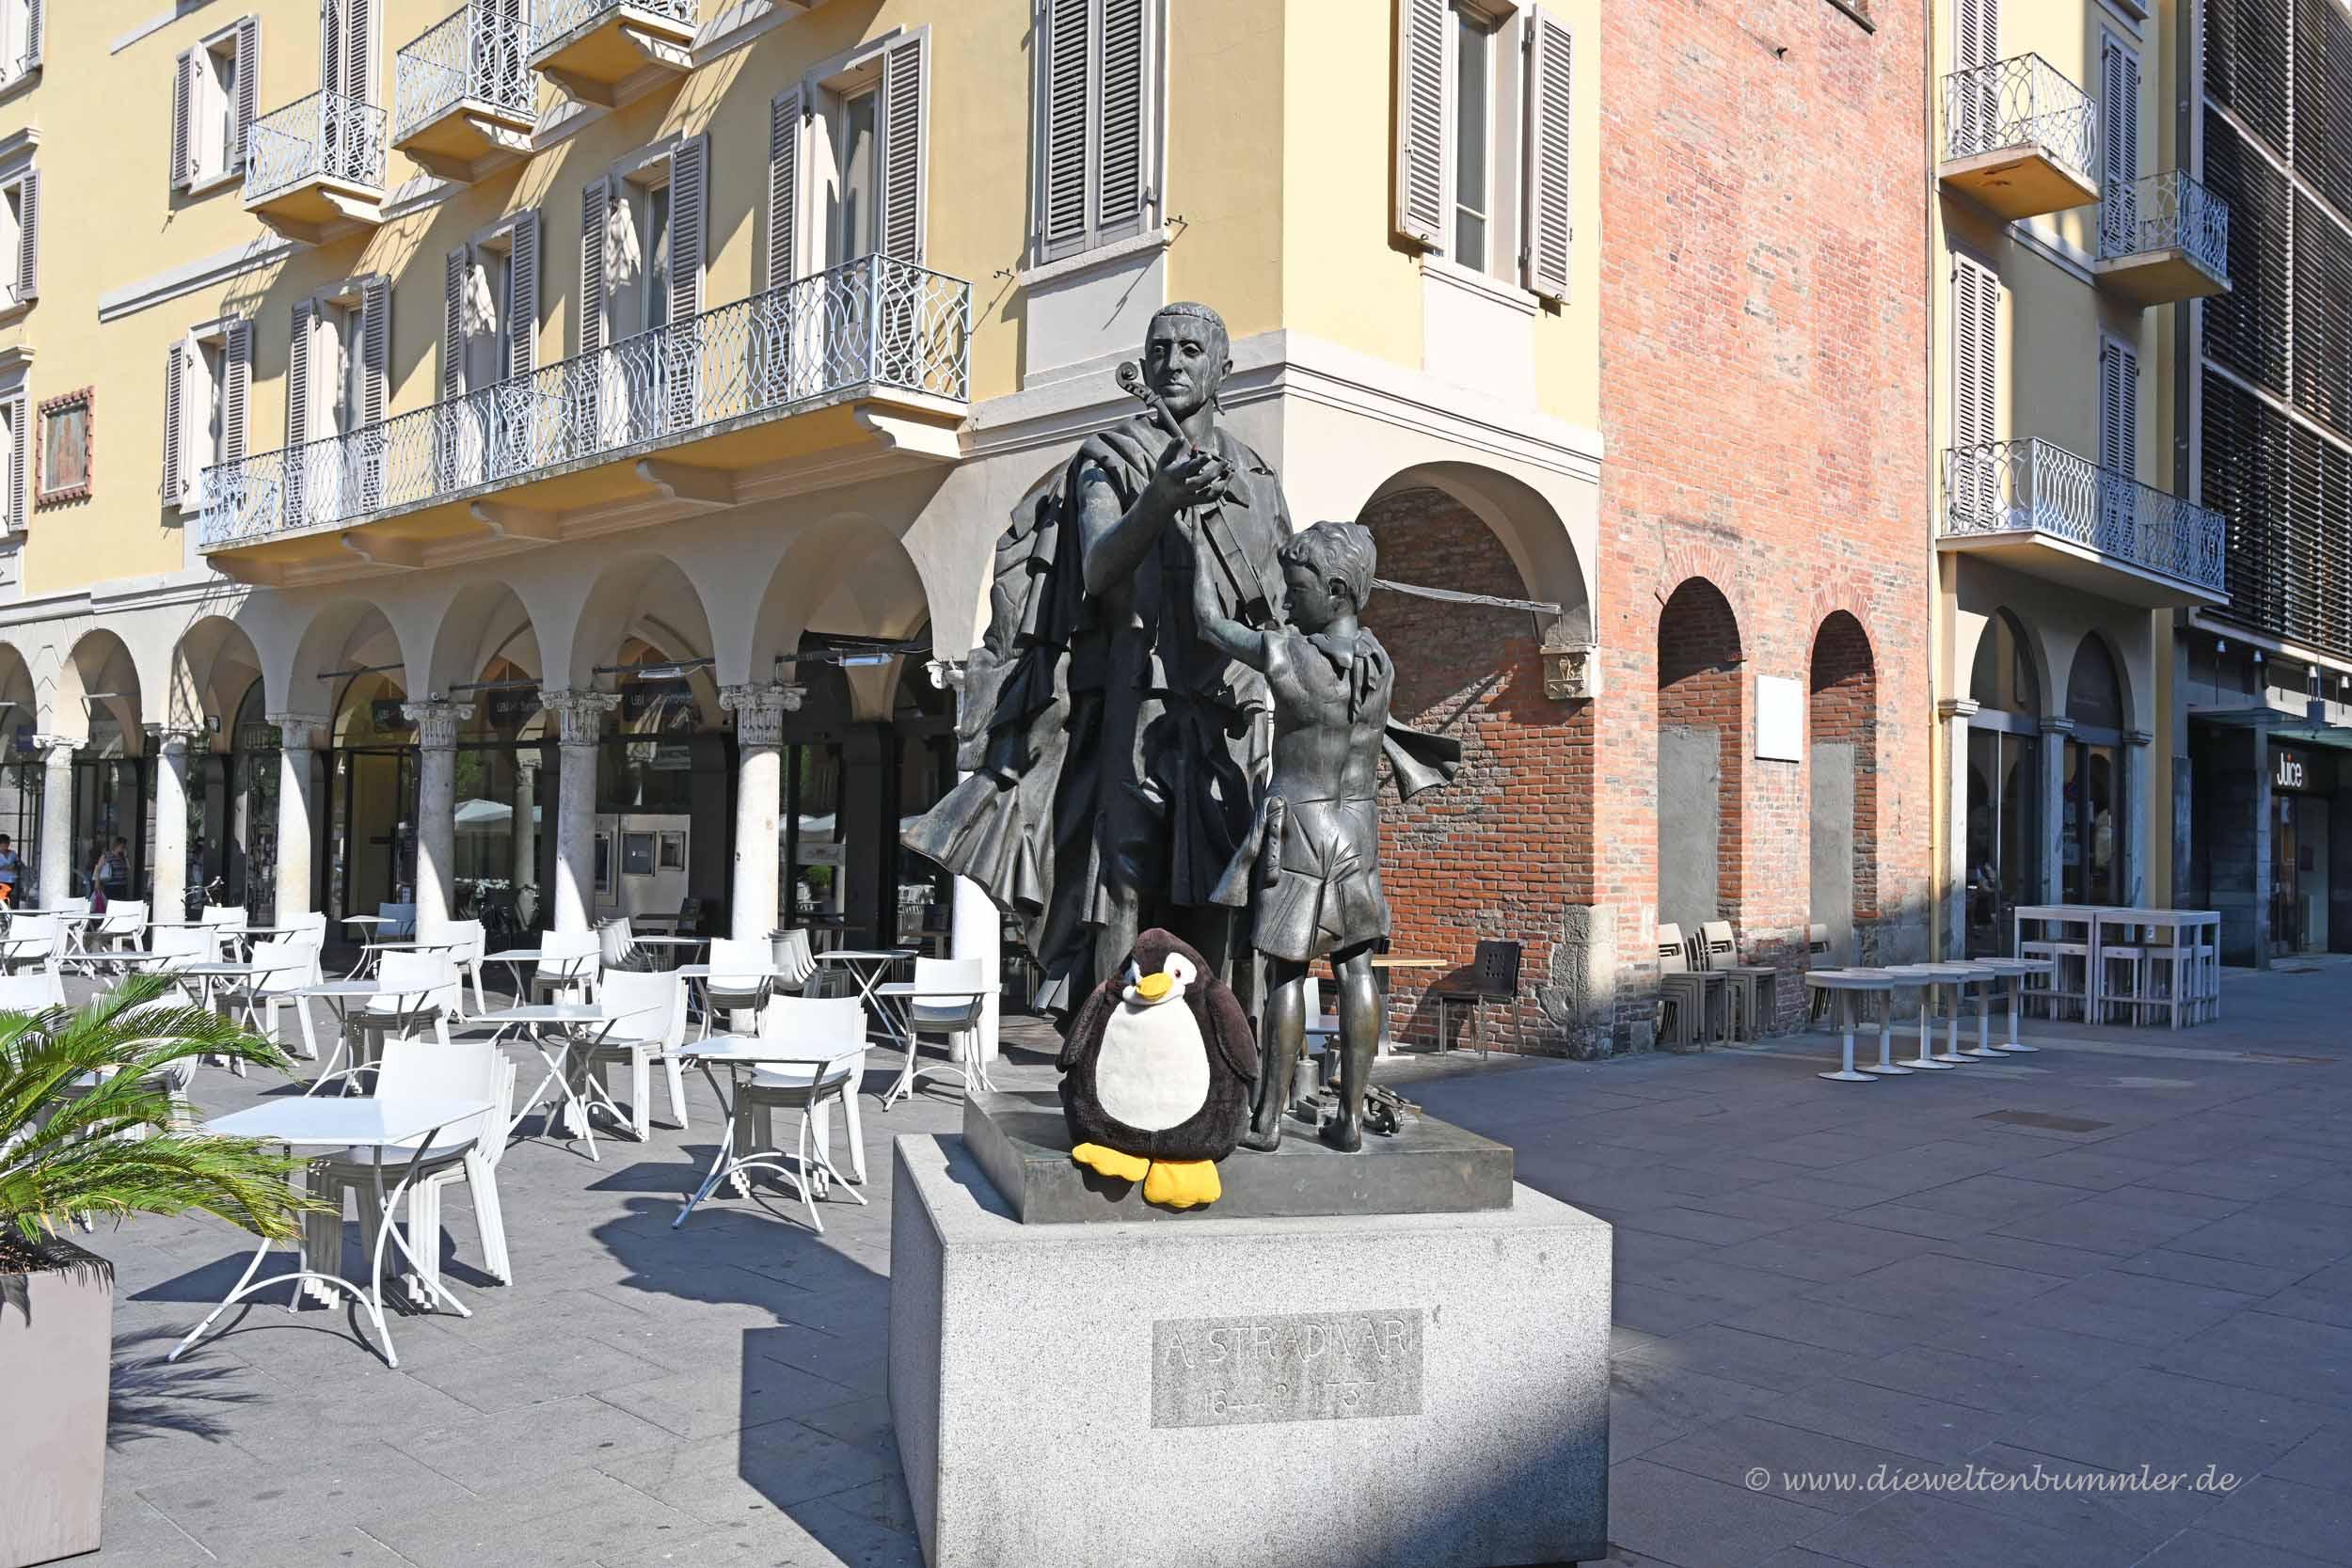 Cremona - Stradivari